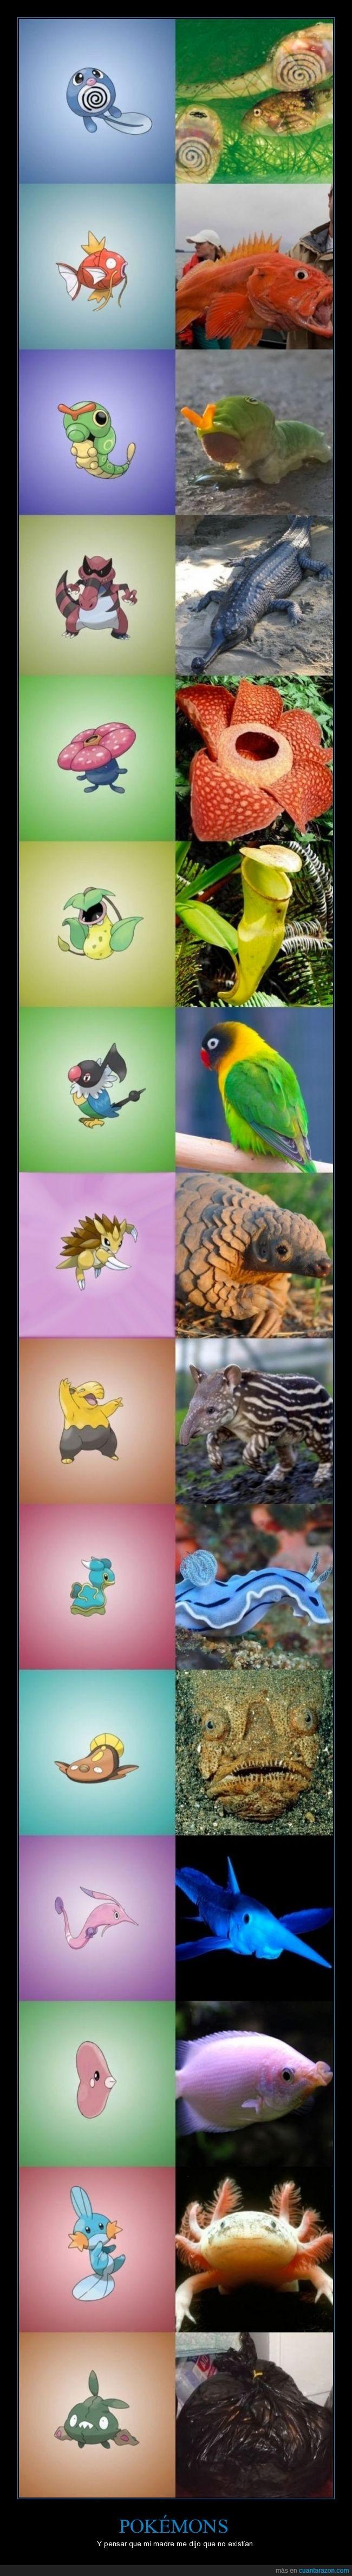 animal,basuramon,existe,inspiracion,pokemon,real,tipo,verdad